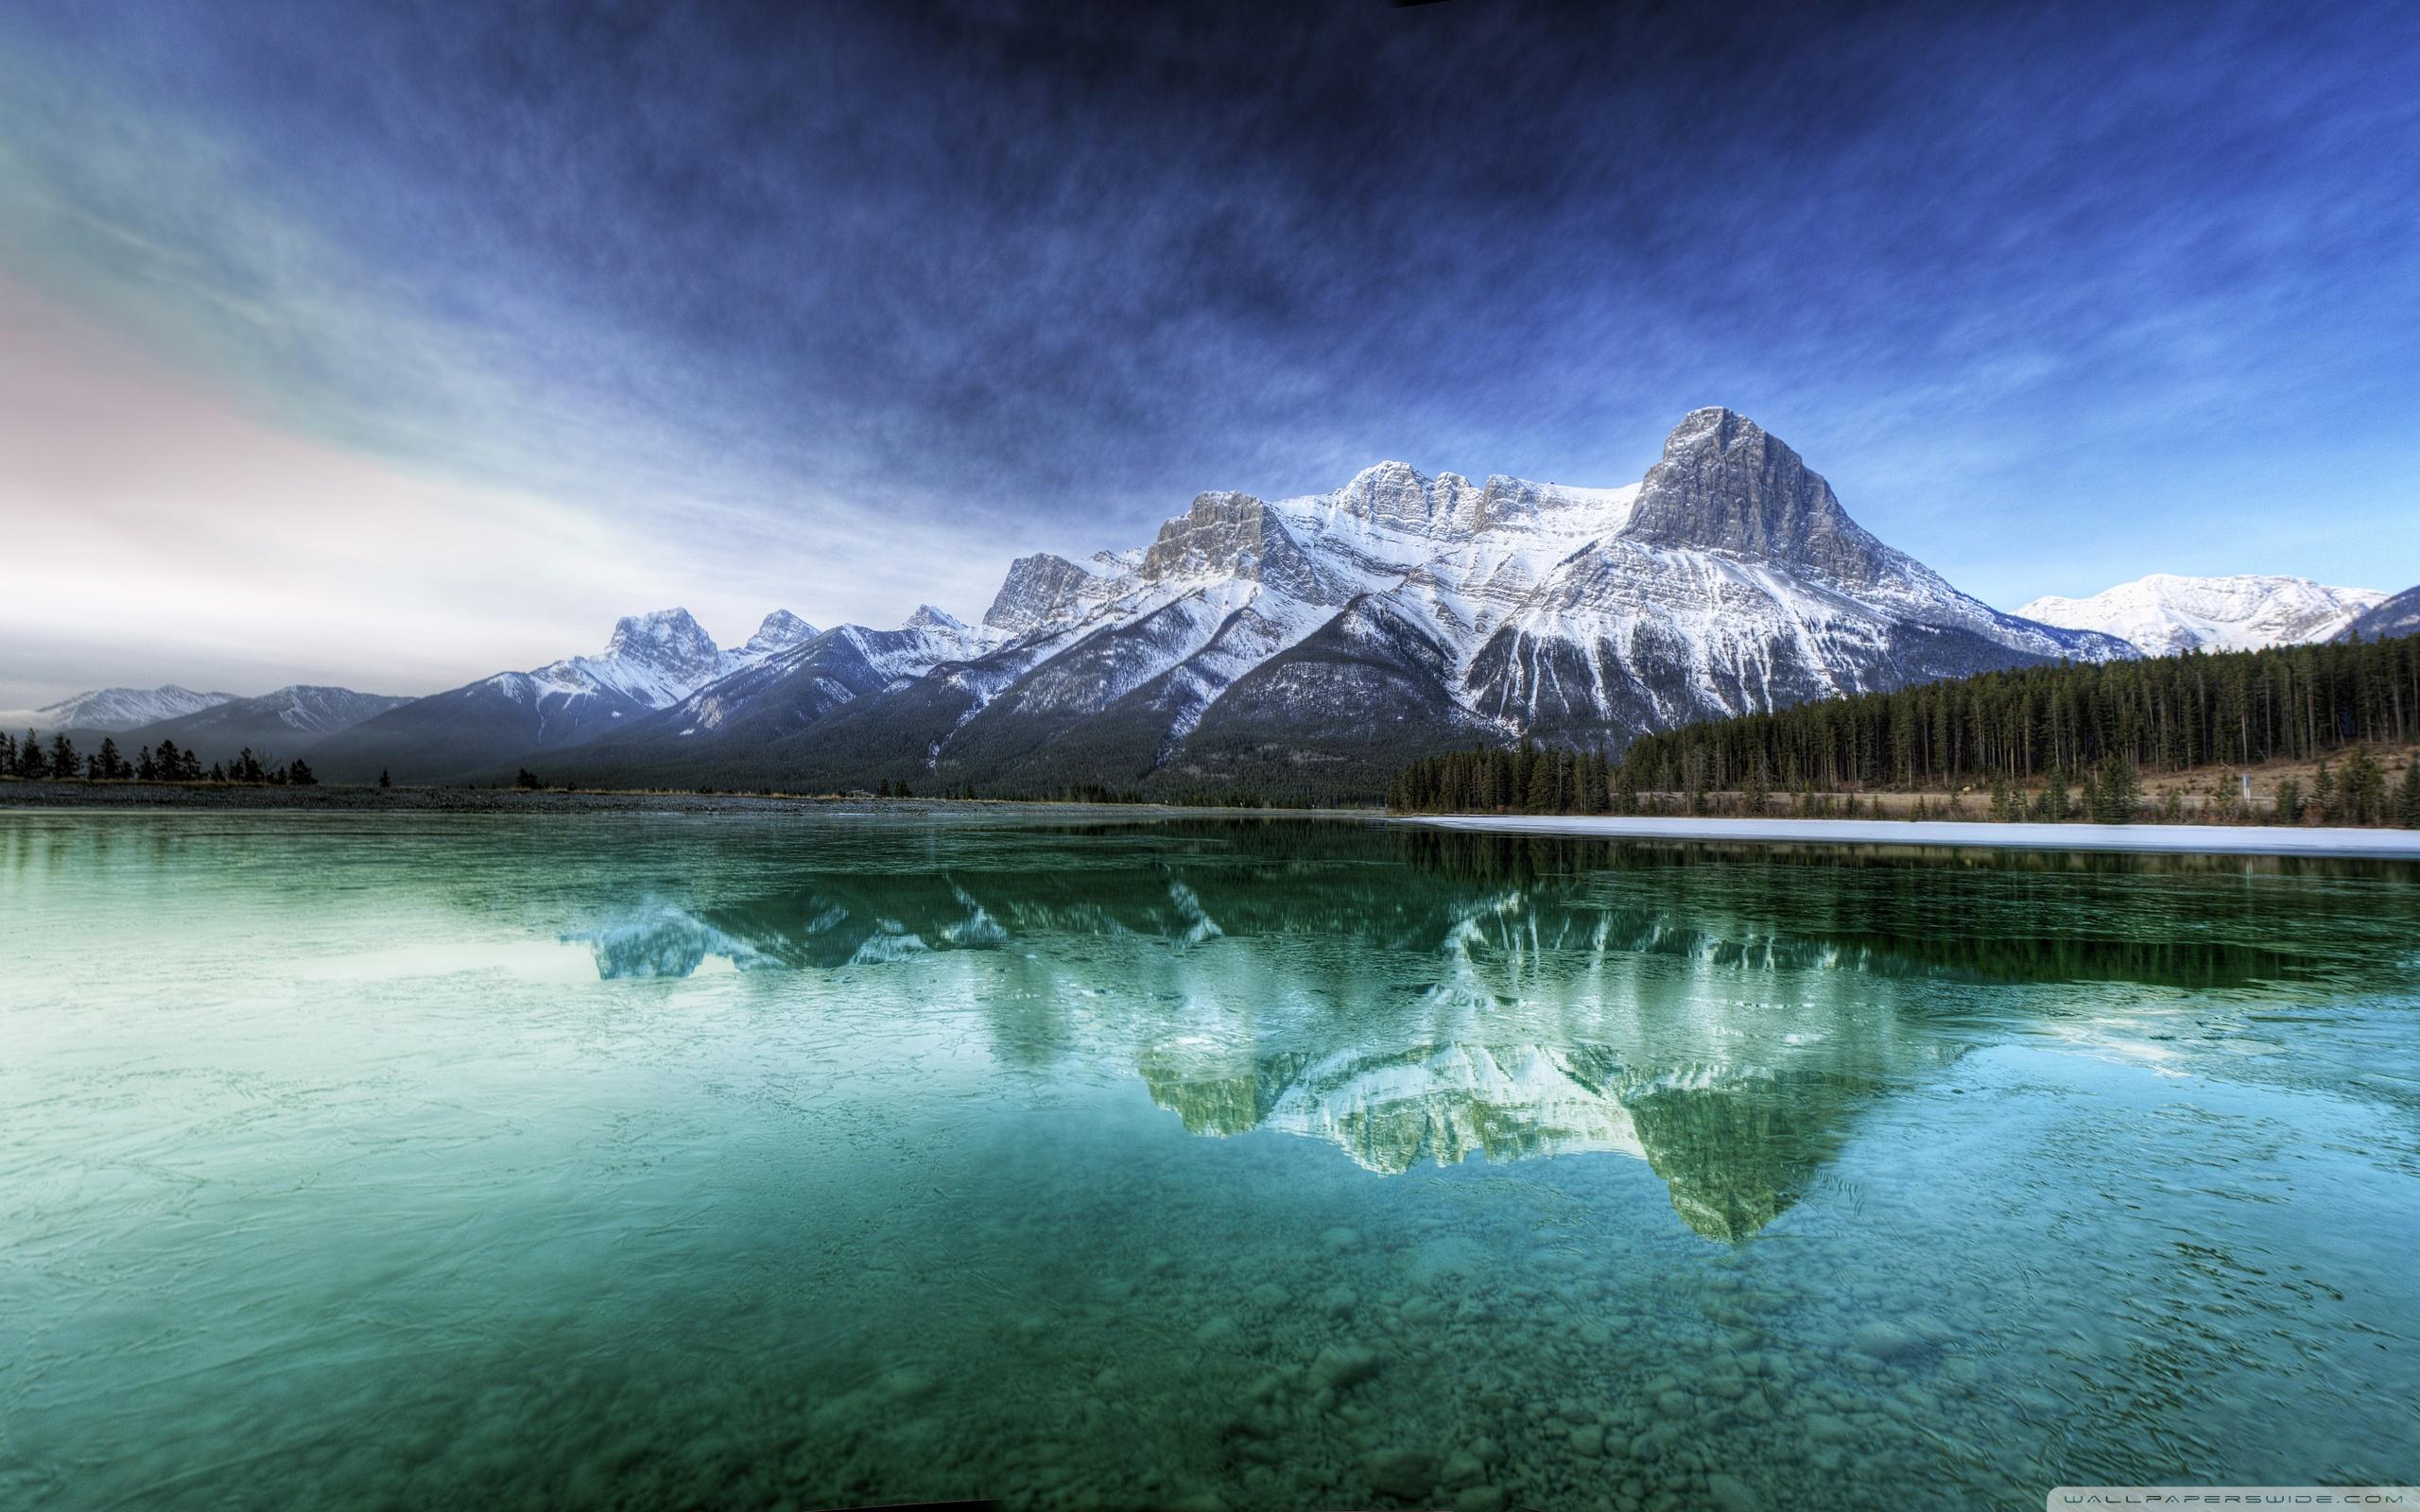 Good Wallpaper Mountain Water - hd-wallpaper-mountains-24  Image_475474.jpg